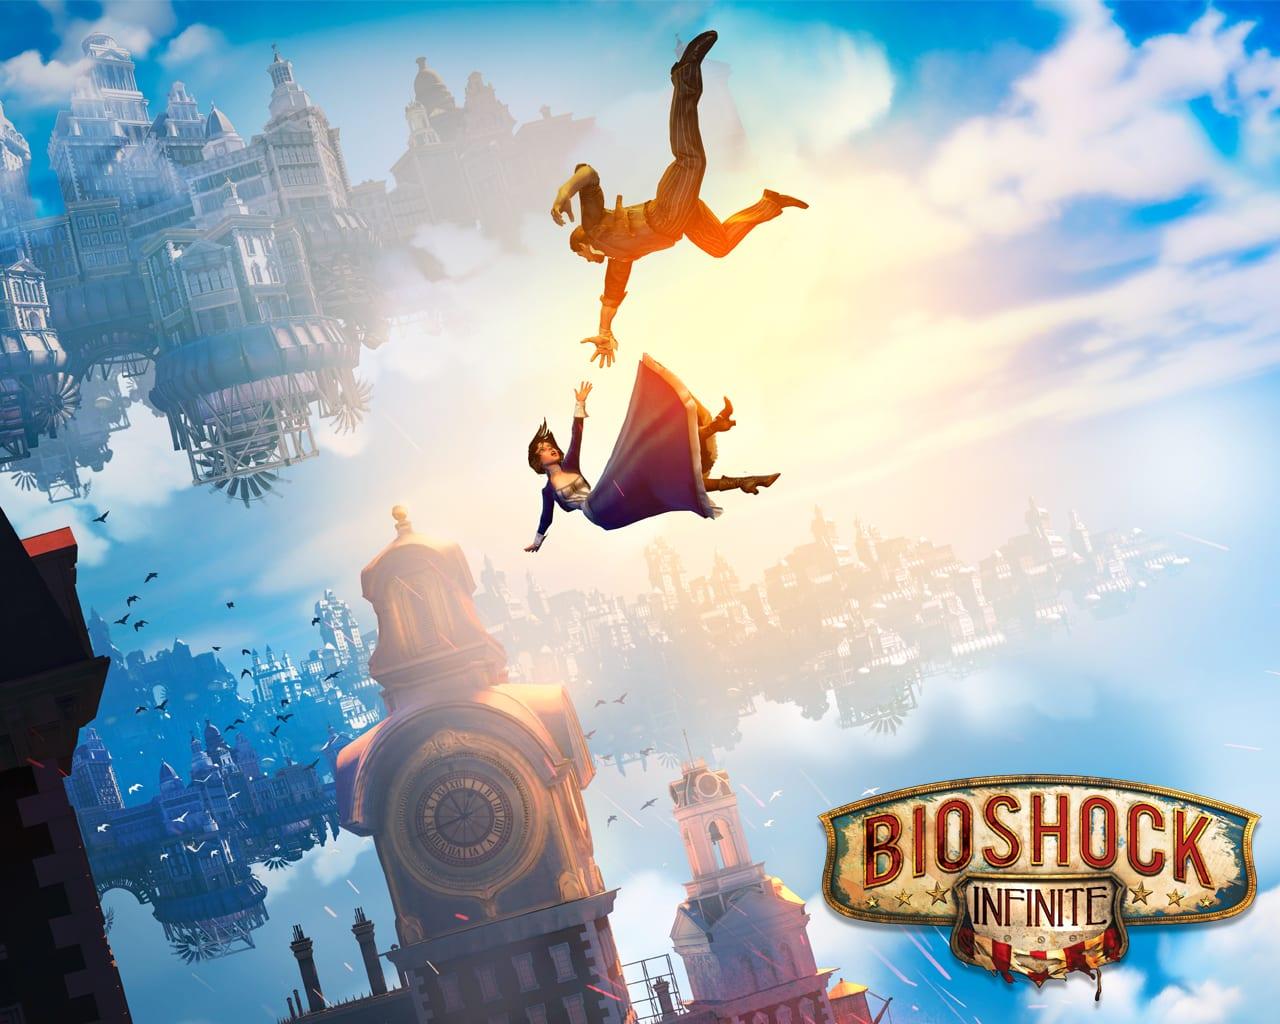 Bioshock Infinite Booker and Elizabeth falling